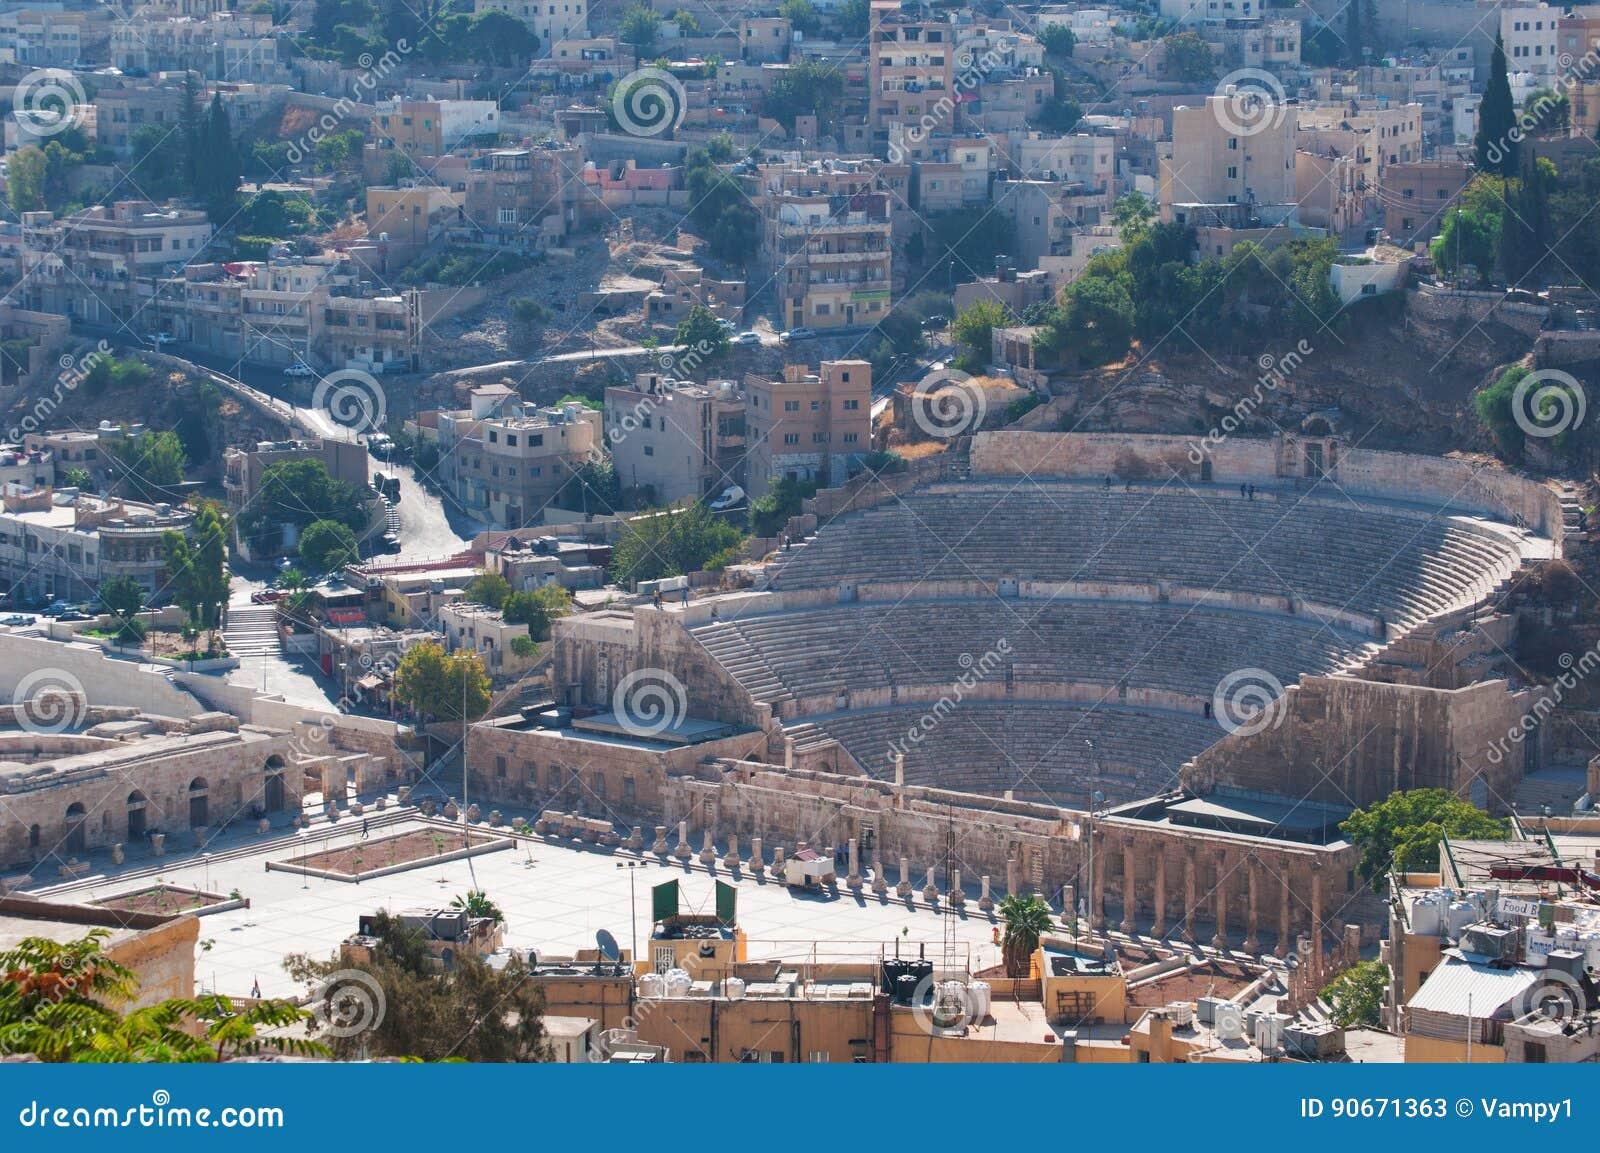 Dating Amman Jordan